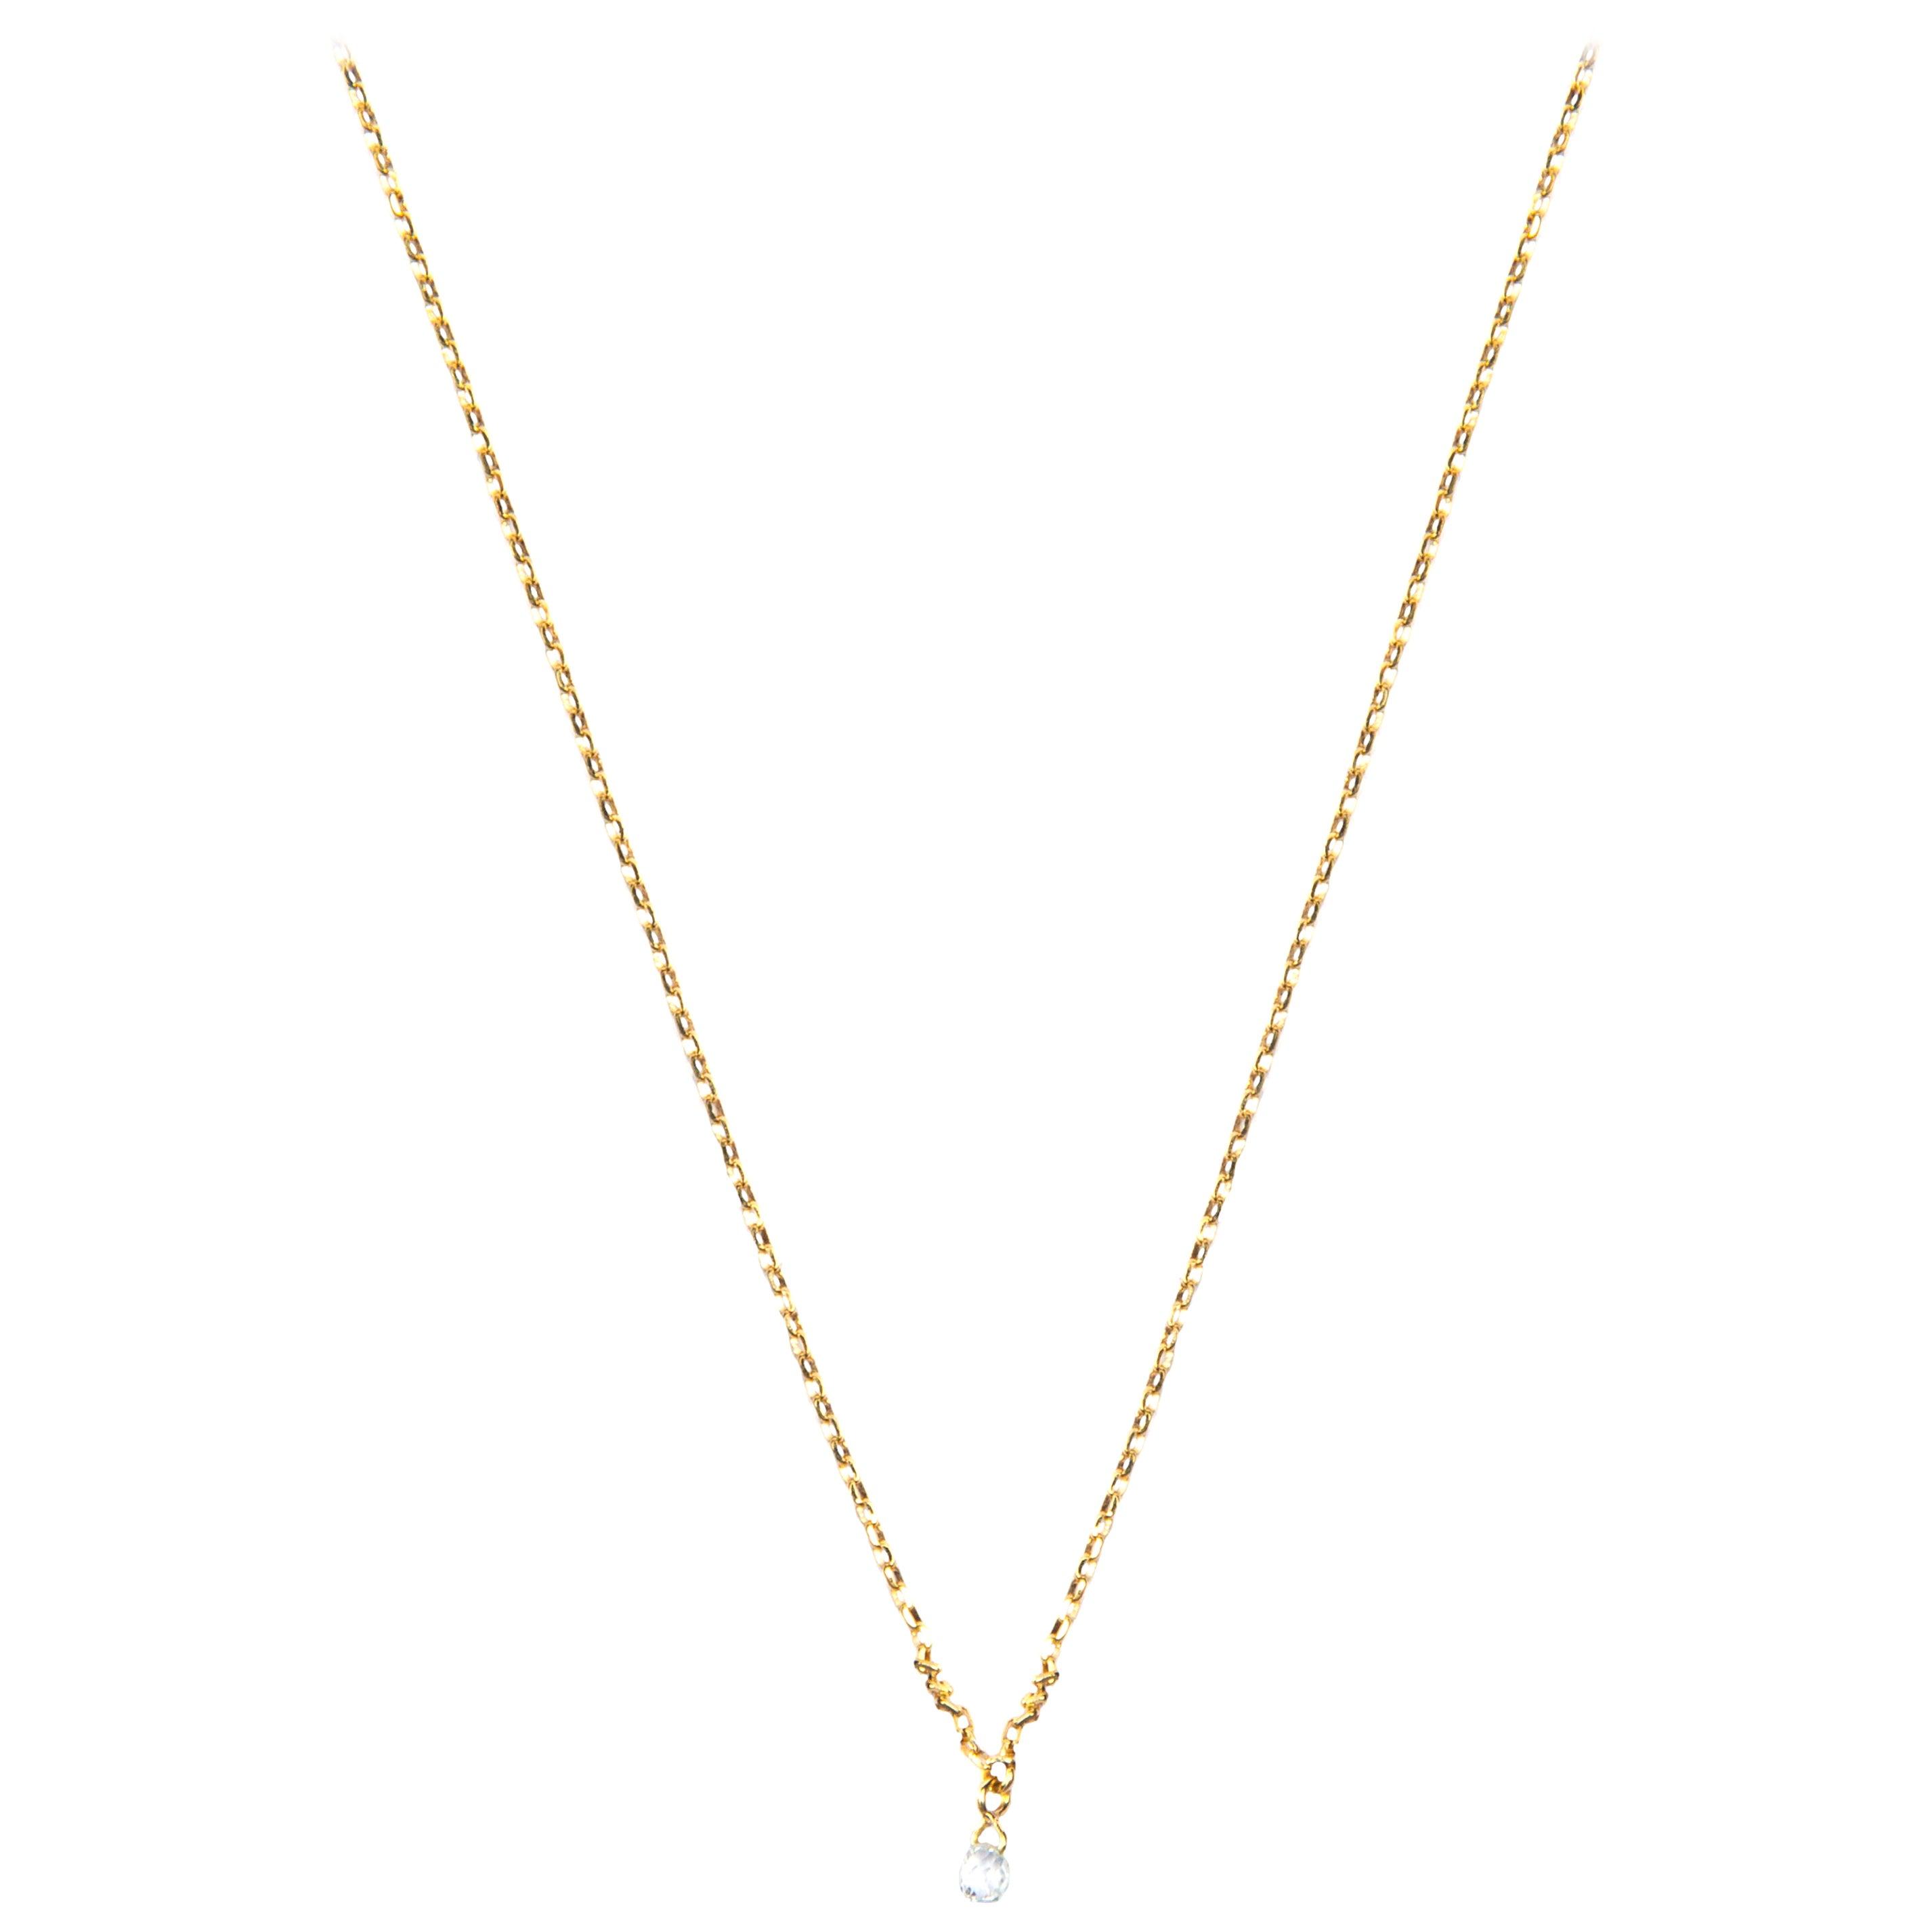 Jona White Diamond 18 Karat Yellow Gold Necklace